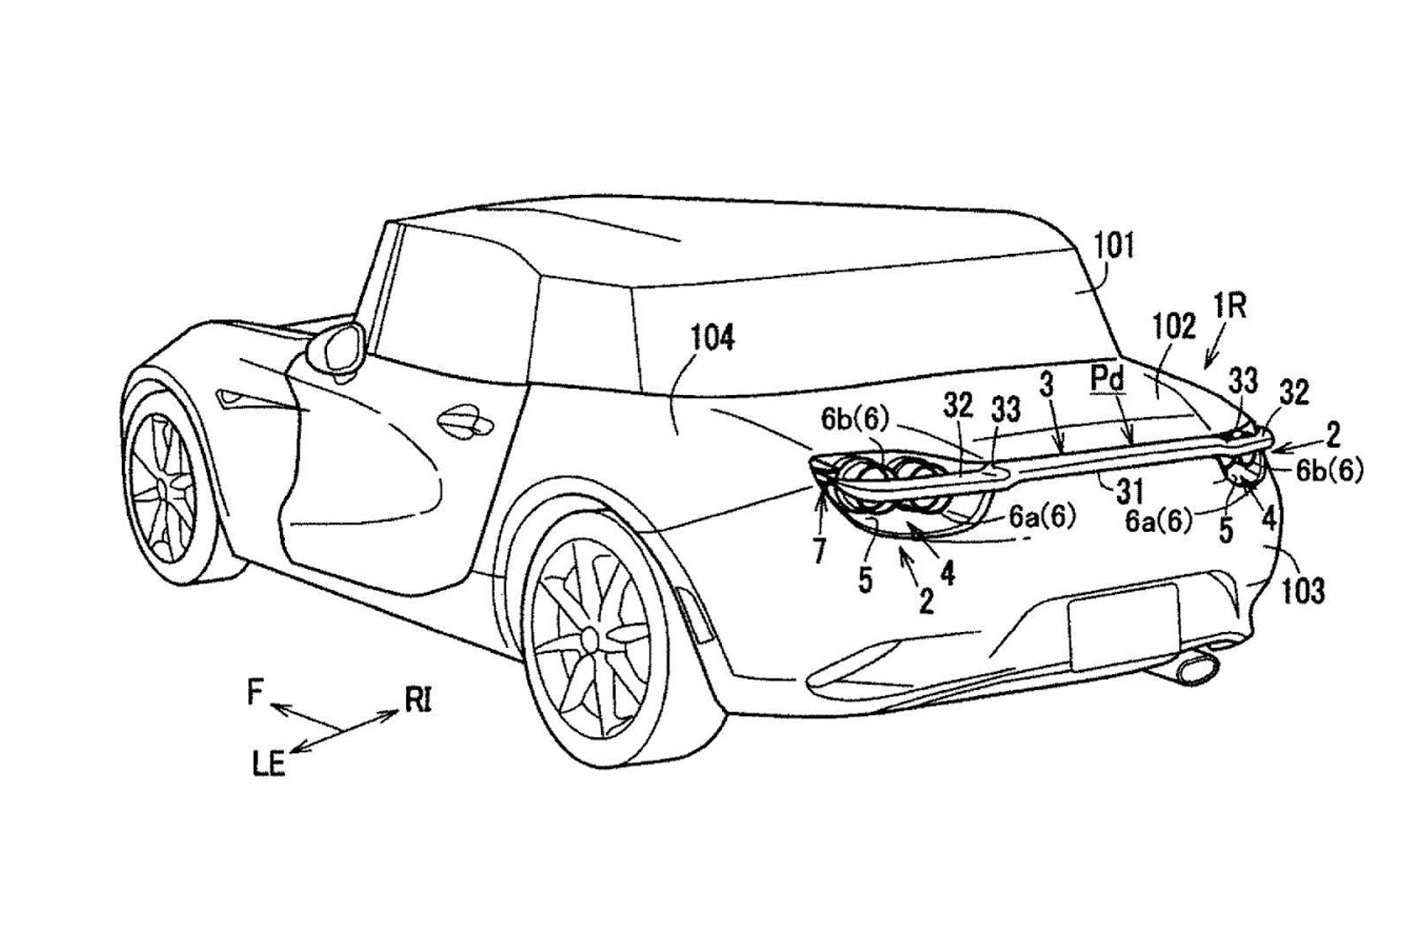 Mazda retractable wing patent